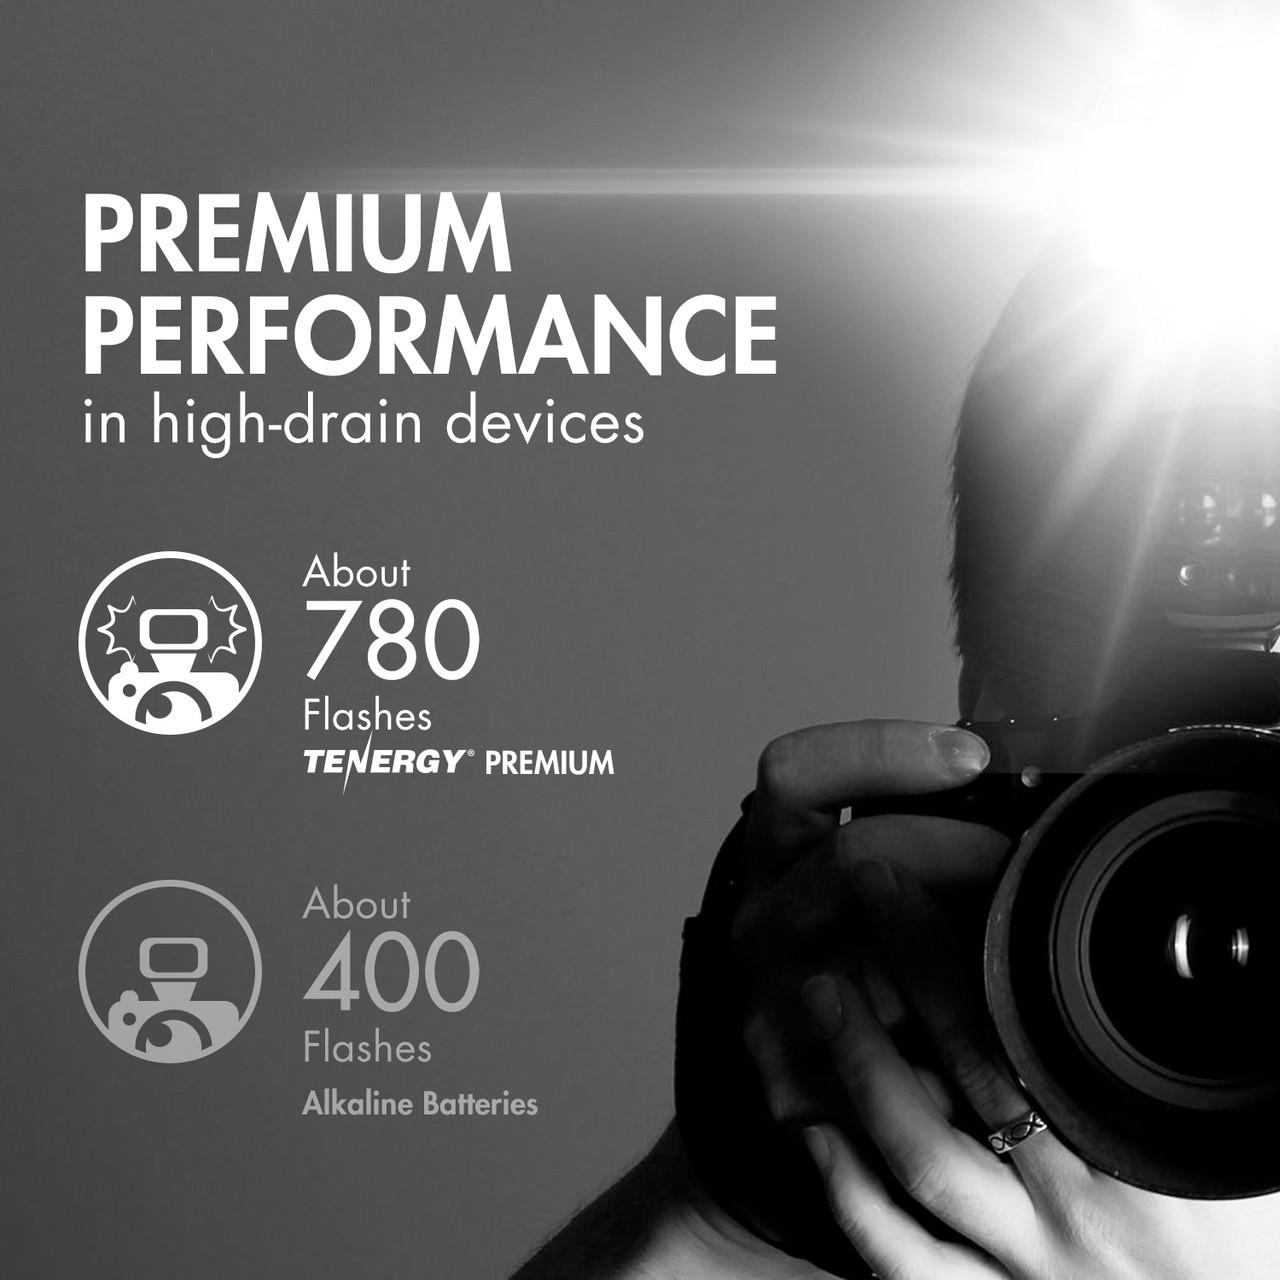 Combo: 24 pcs Tenergy Premium NiMH Rechargeable Batteries (12AA/12AAA)